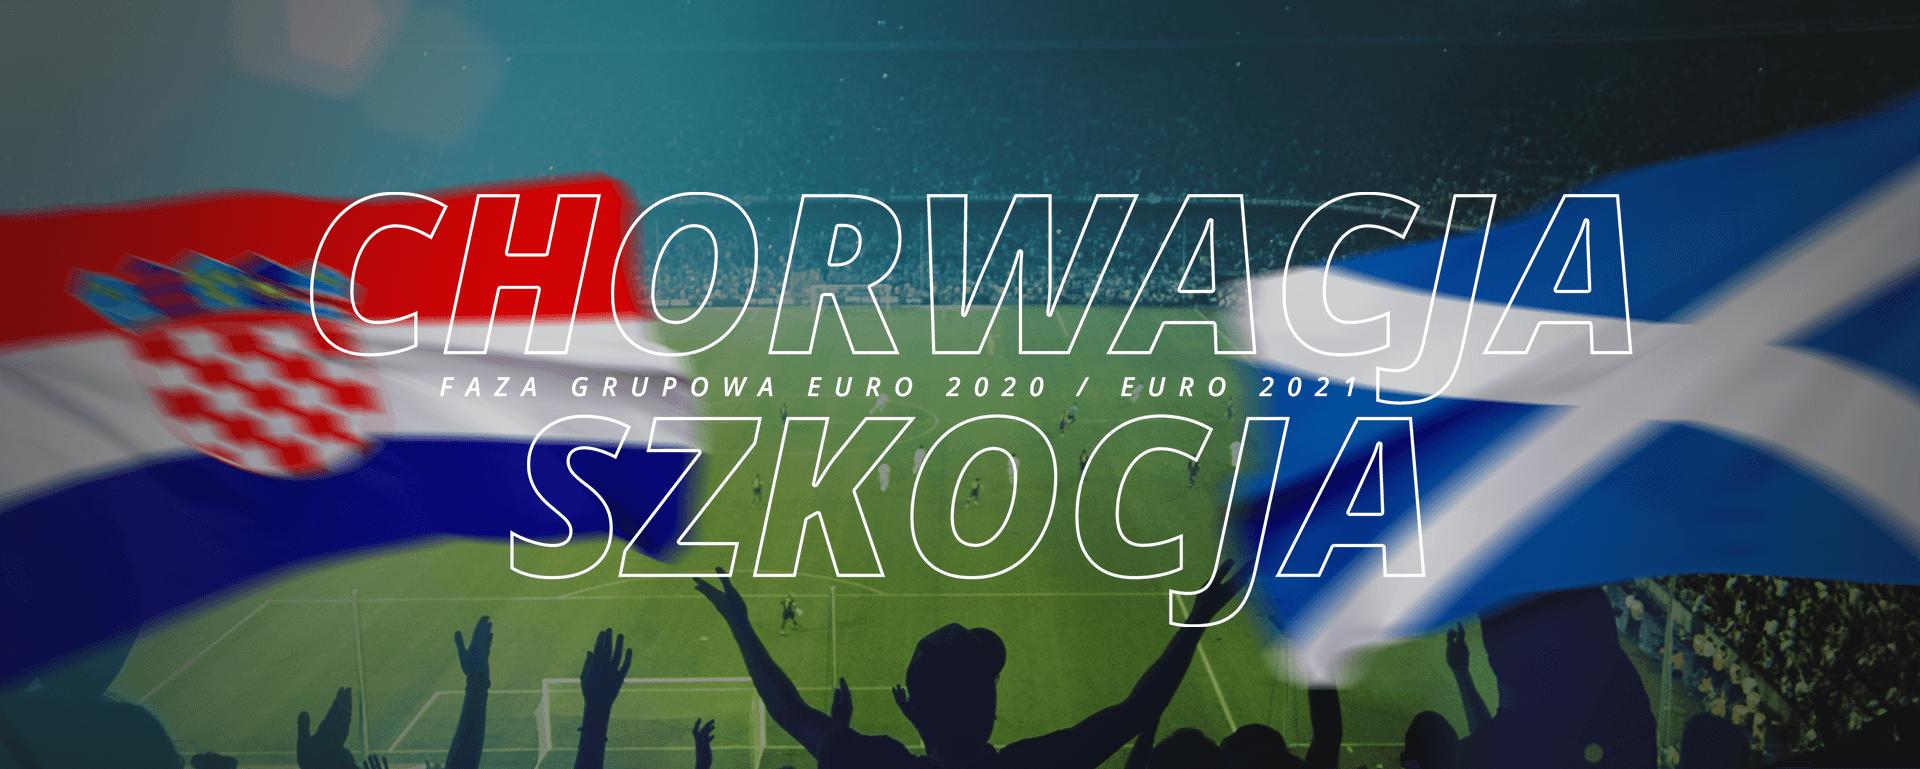 Chorwacja – Szkocja | faza grupowa Euro 2020 / Euro 2021